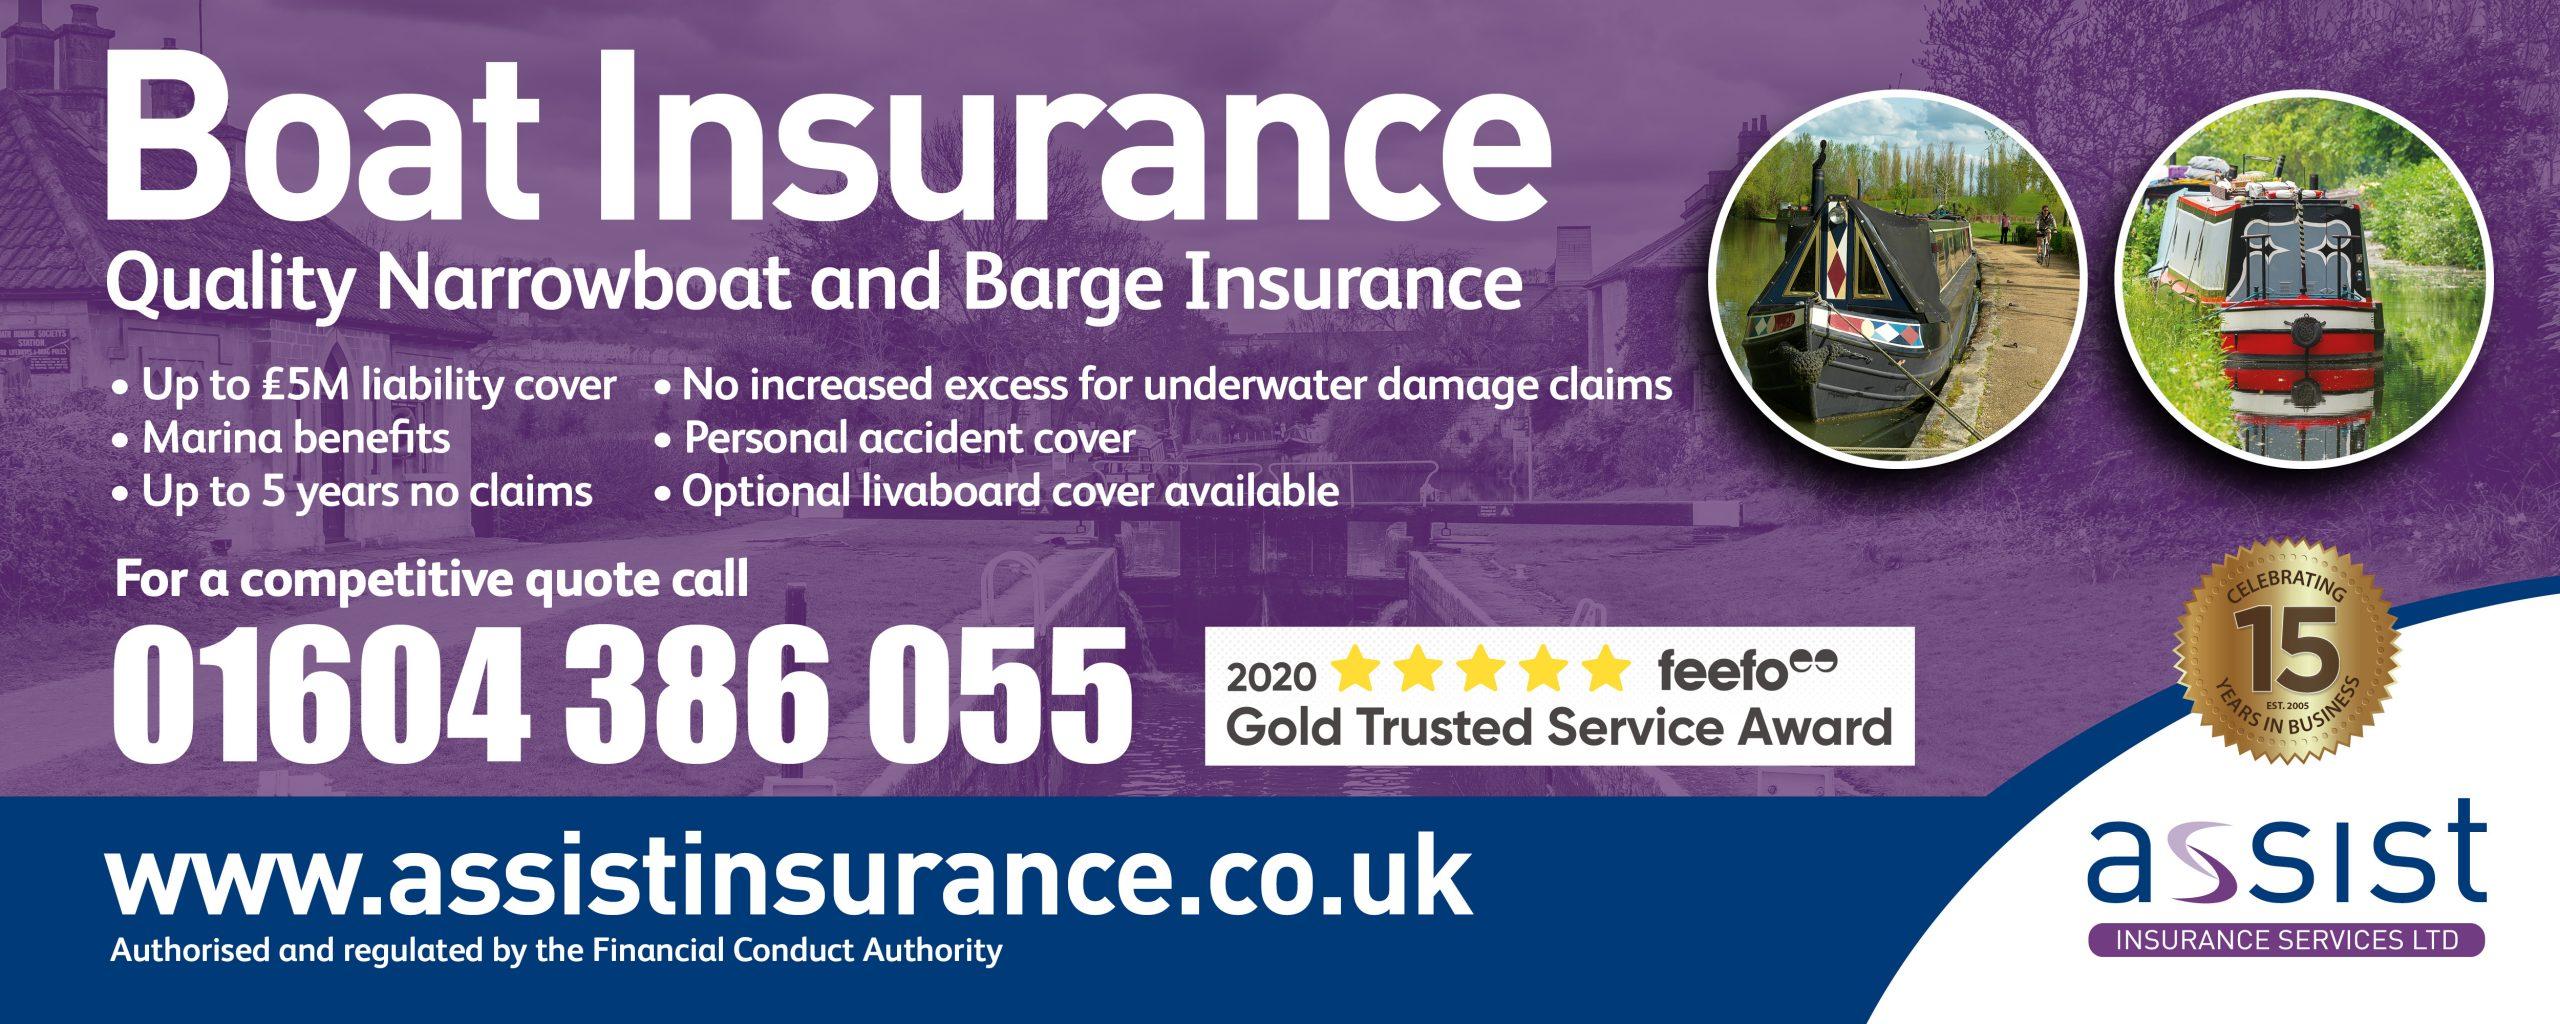 Assist Insurance